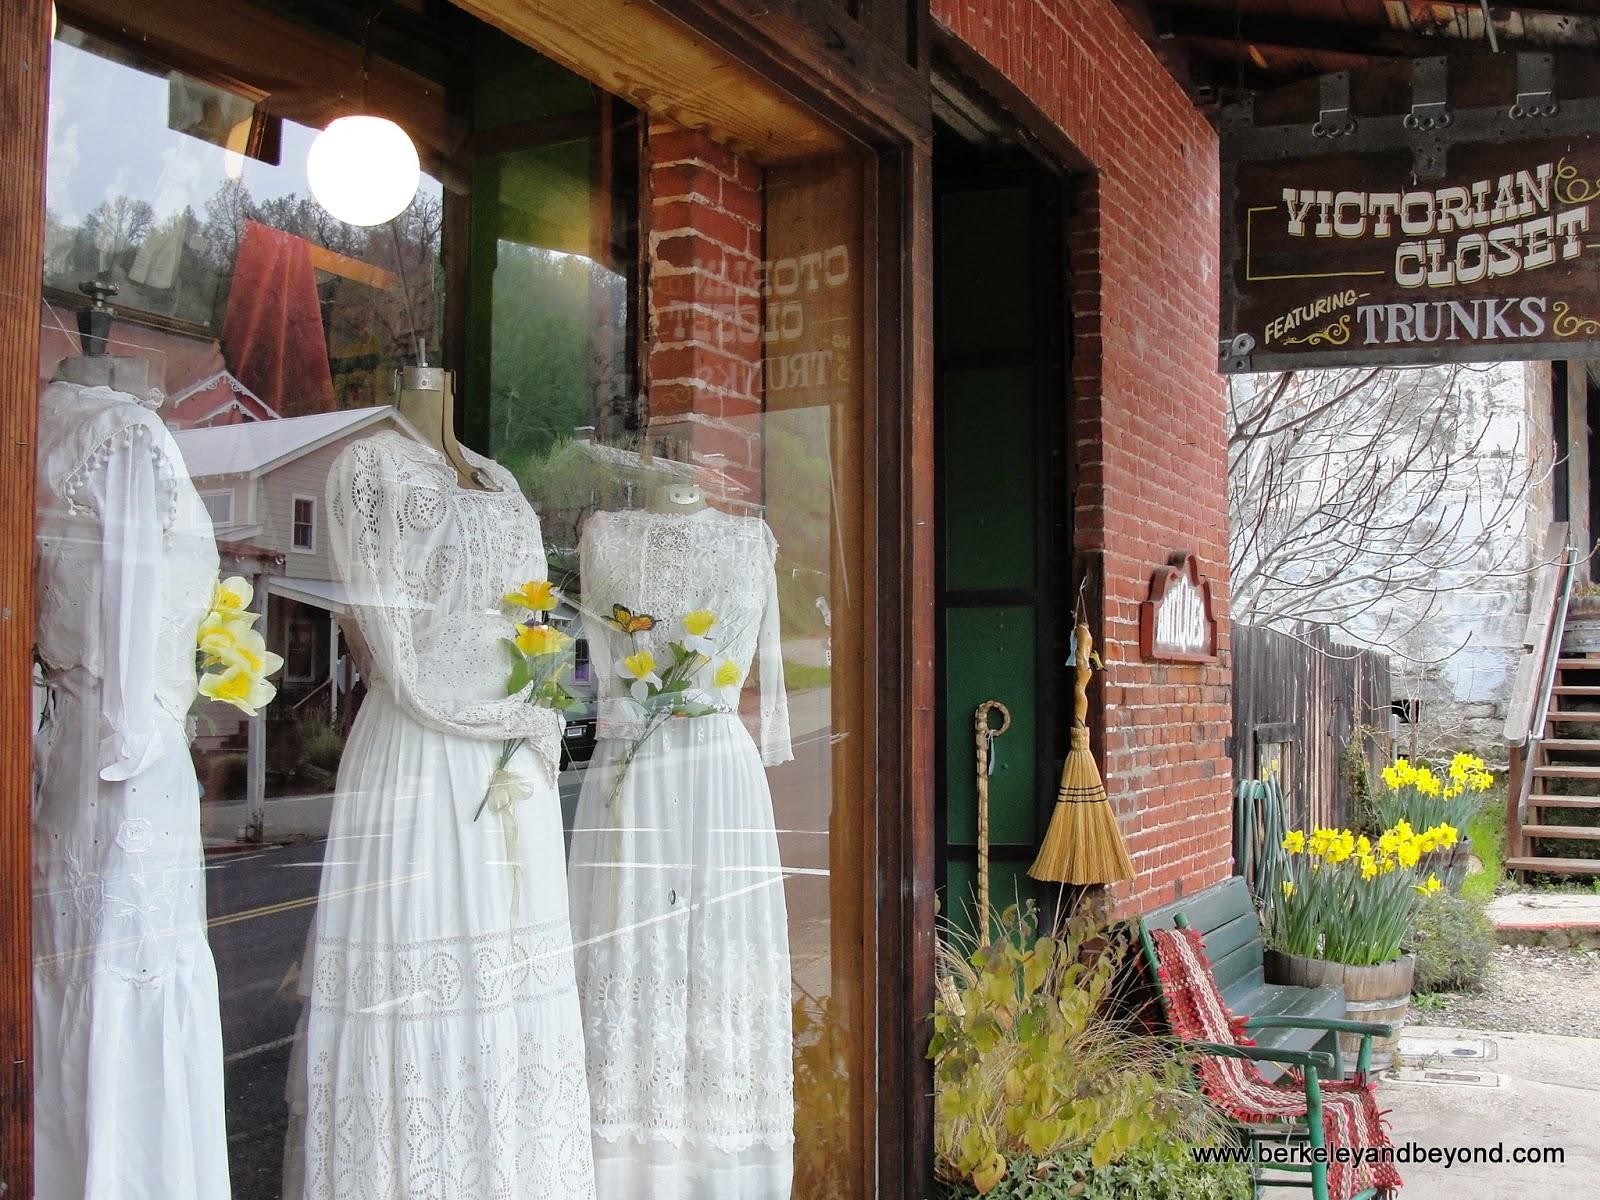 Victorian Closet in Amador City, California